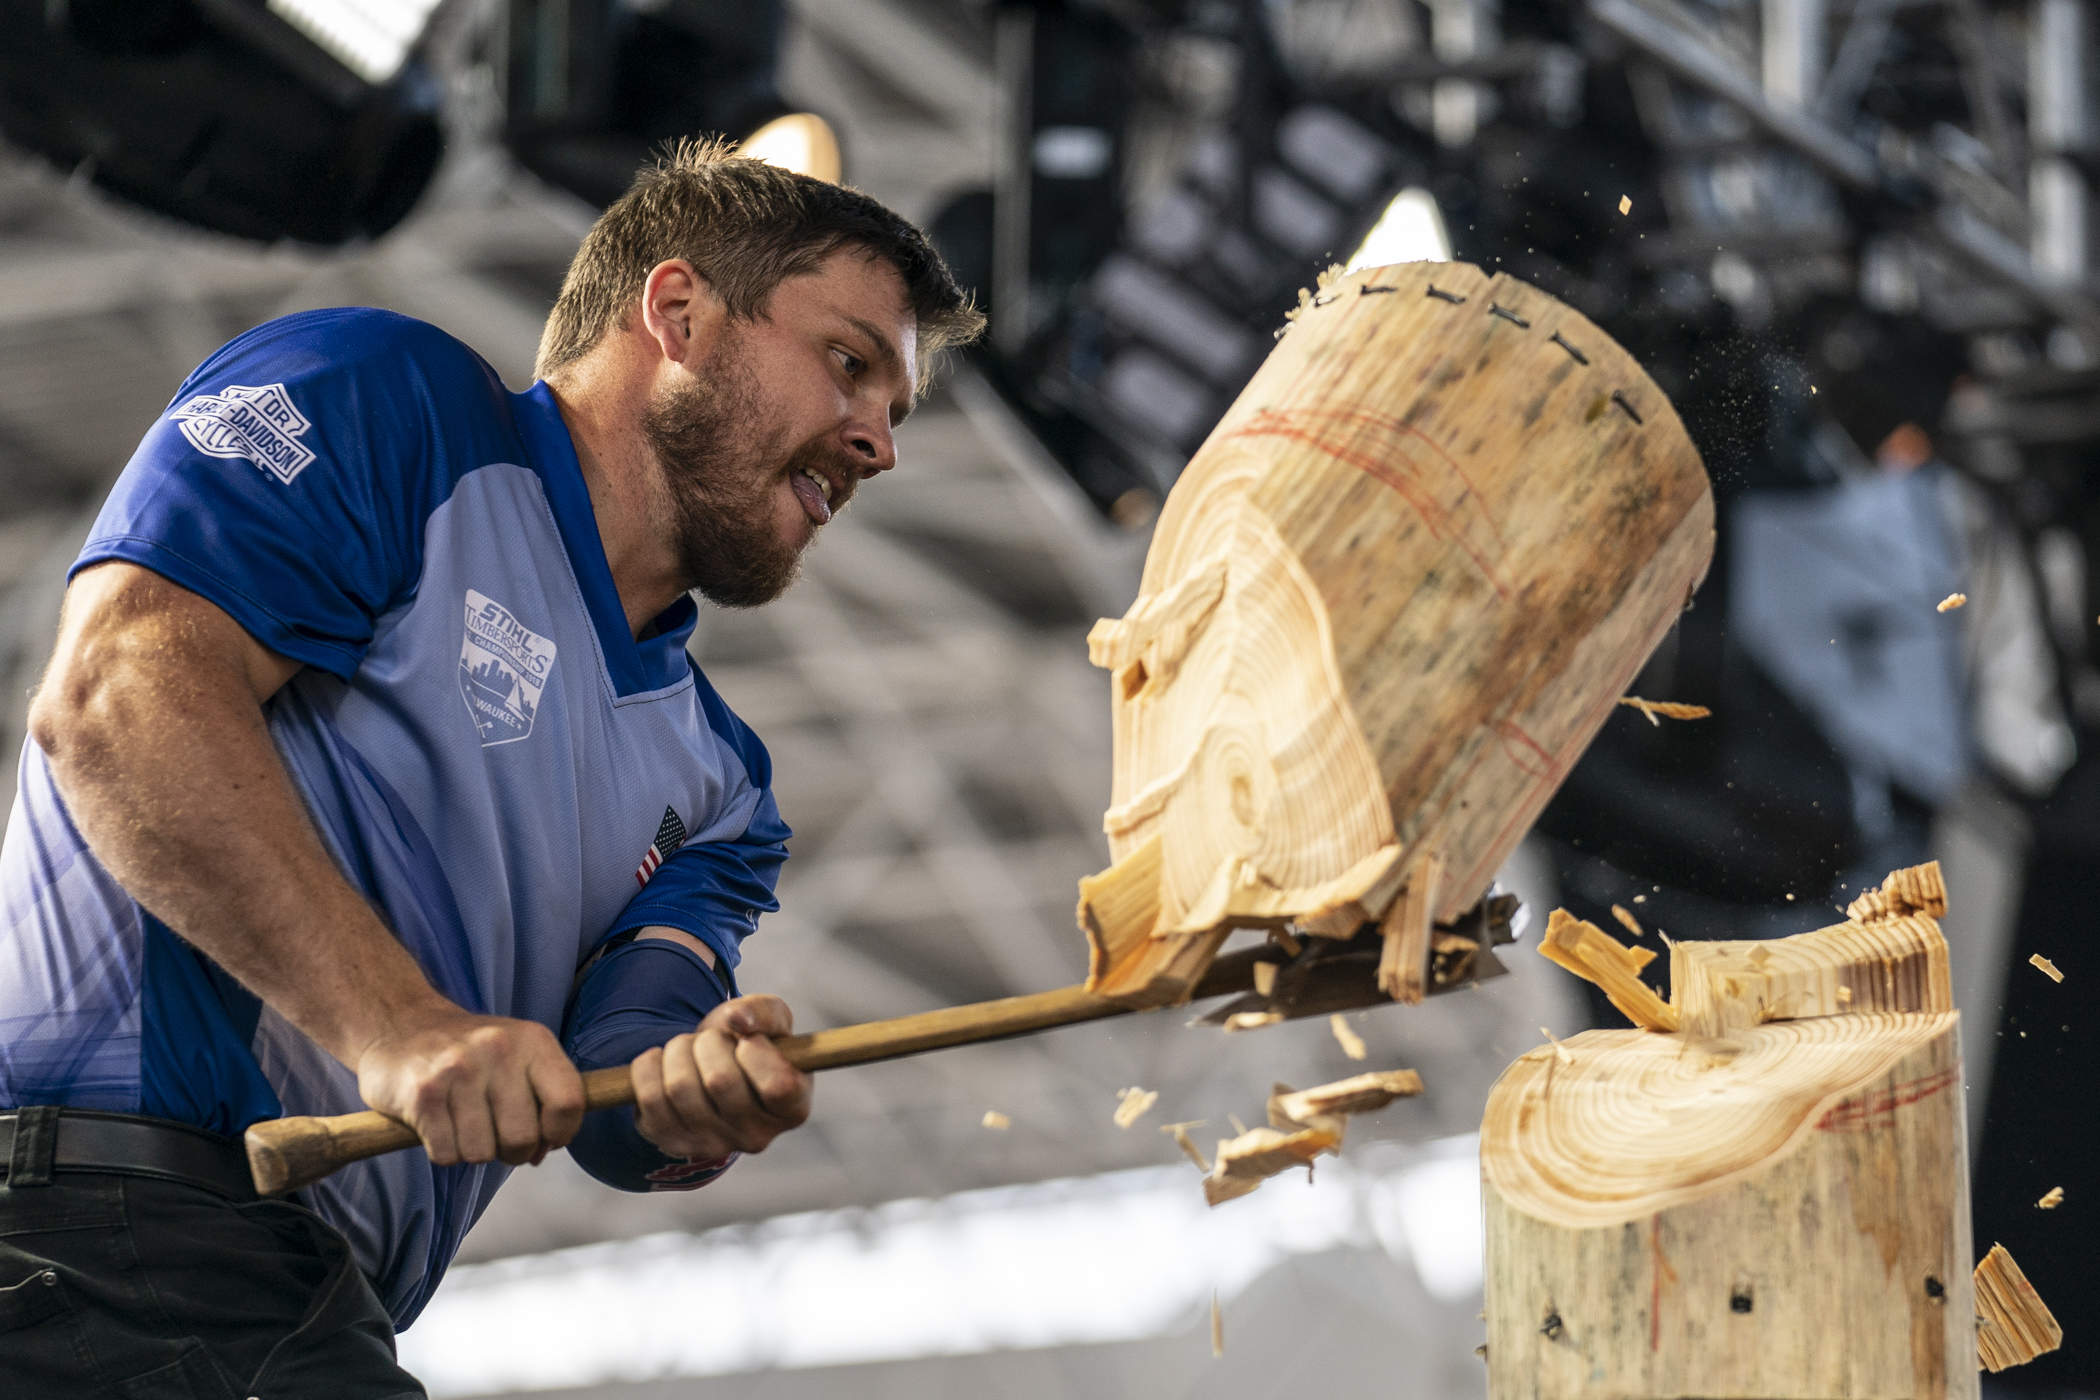 The champion dominates in the springboard chop